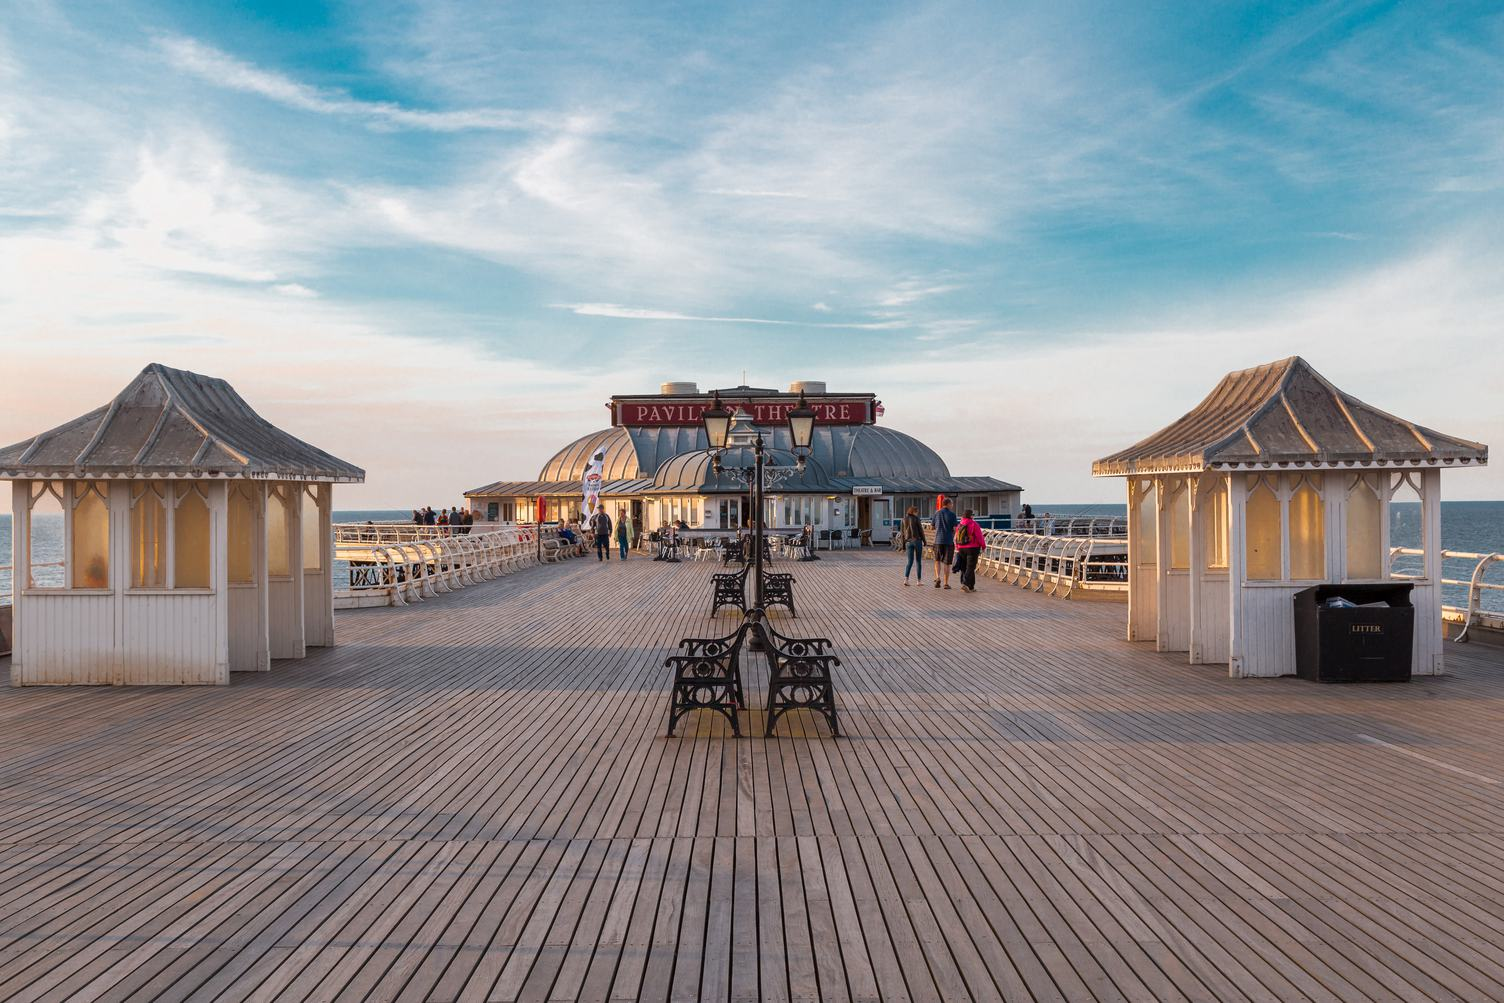 Cromer Pier on the Norfolk Coast in England